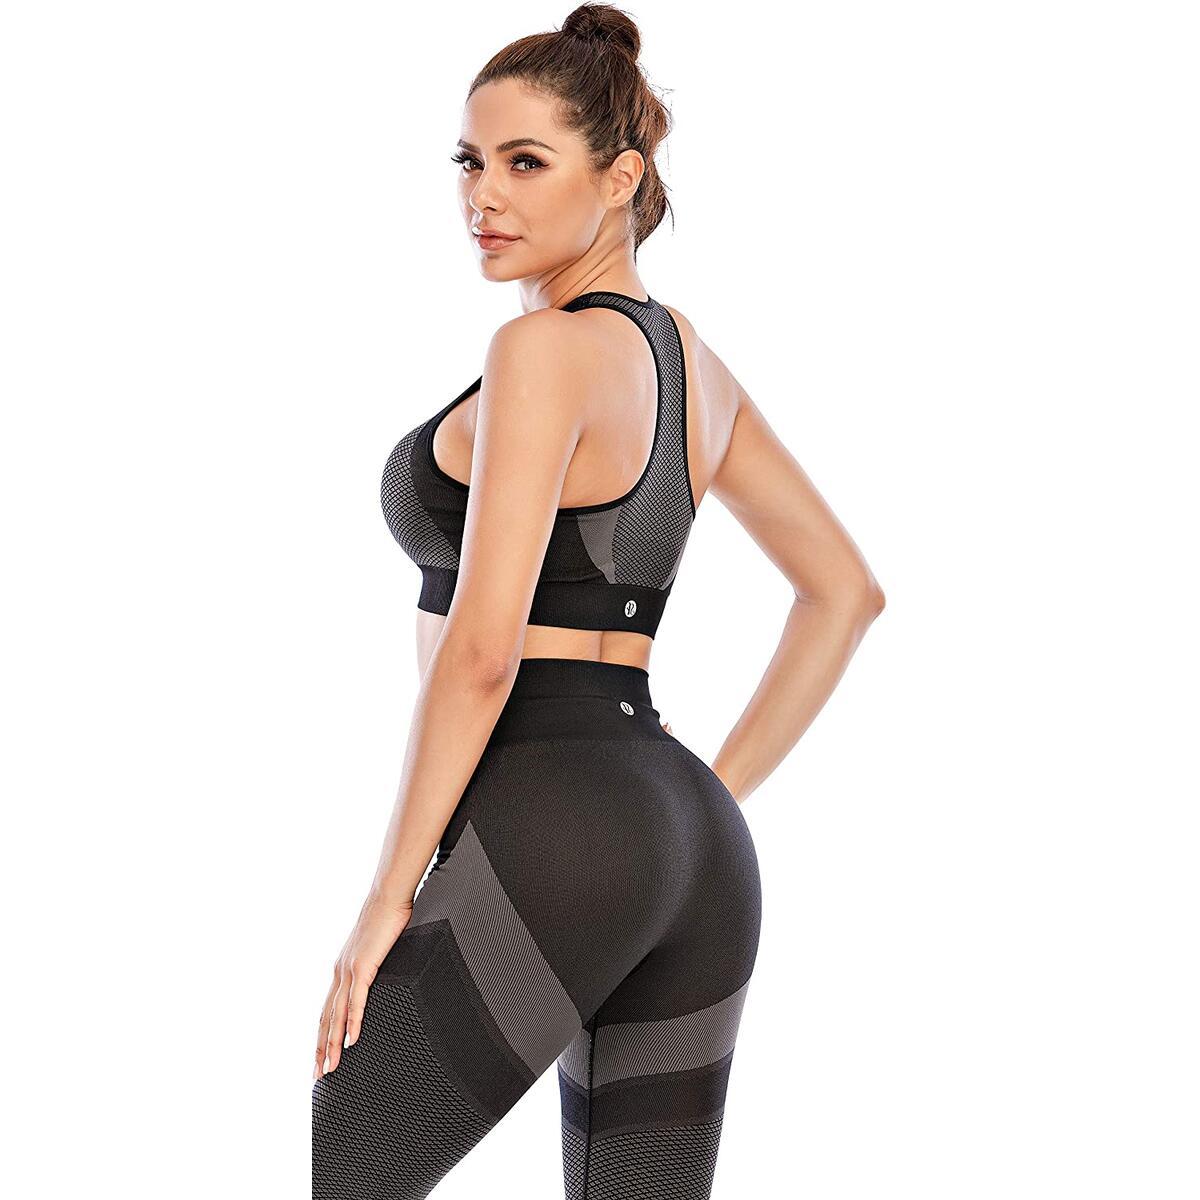 RUNNING GIRL Racerback Sports Bras for Women, High Impact Padded Push up Yoga Bra Seamless Workout Fitness Activewear Bra…